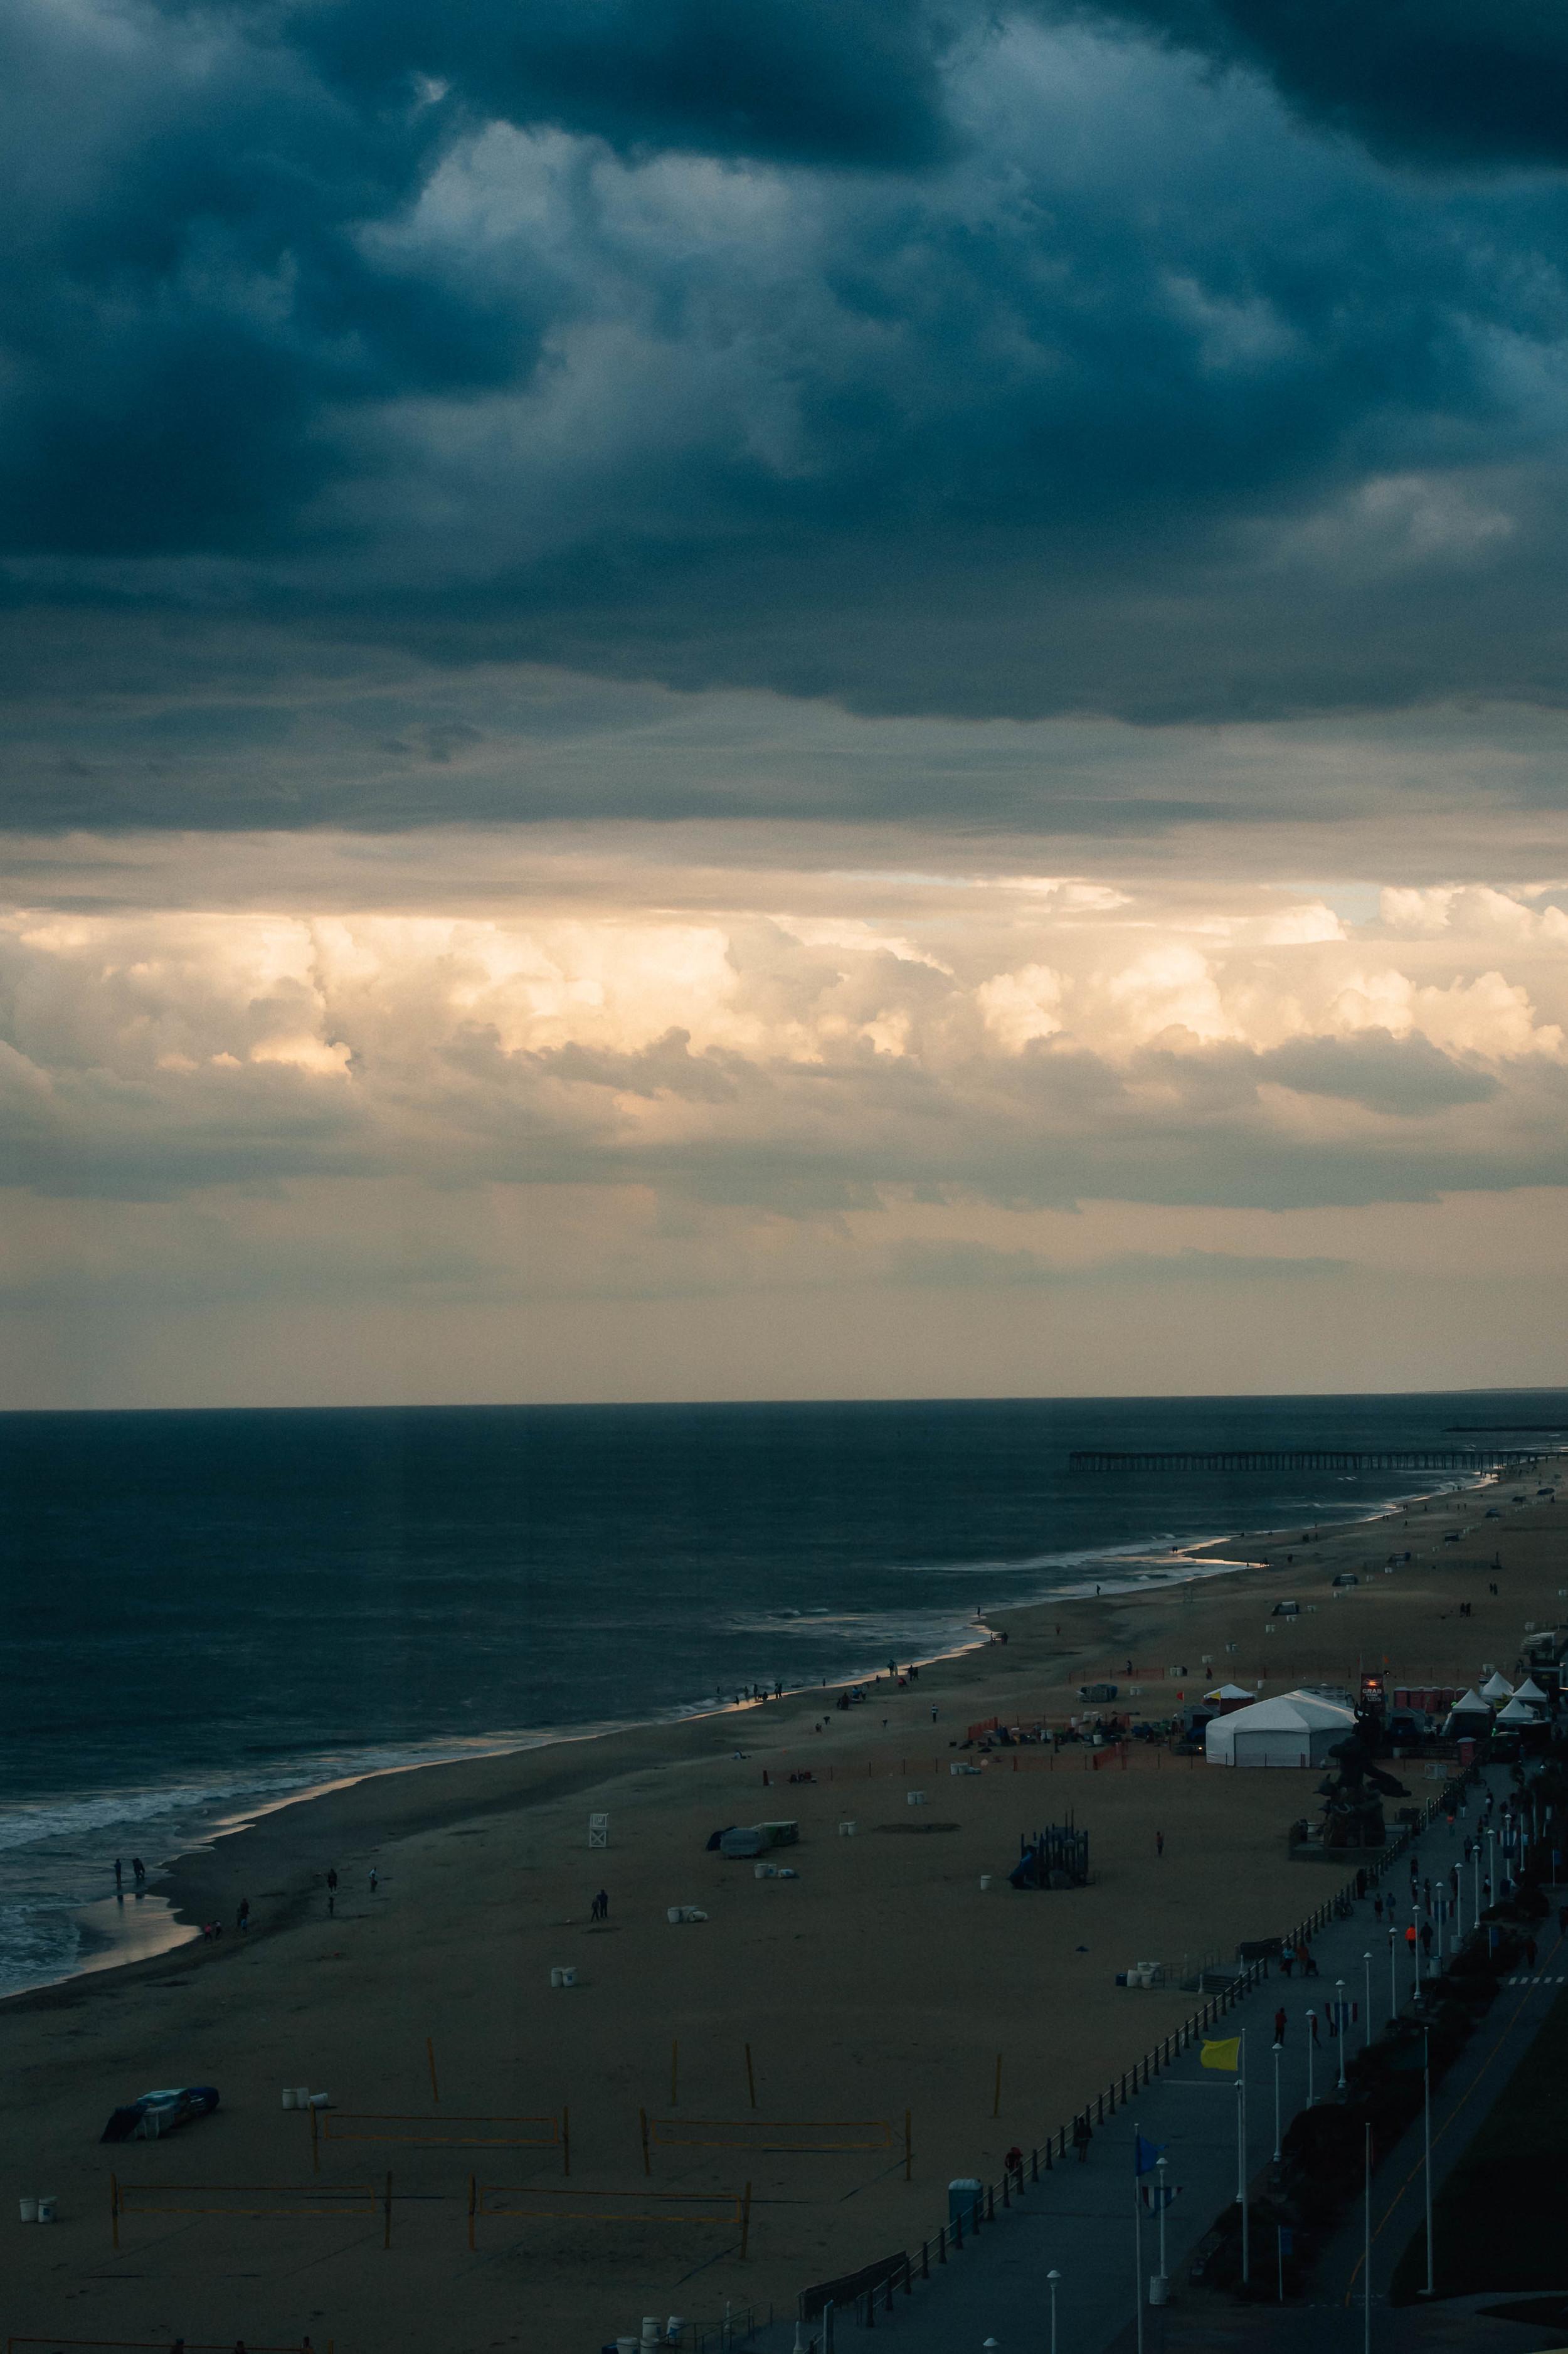 virginia-beach-wedding-photography-oceanfront-storm-clouds-melissa-bliss-photography